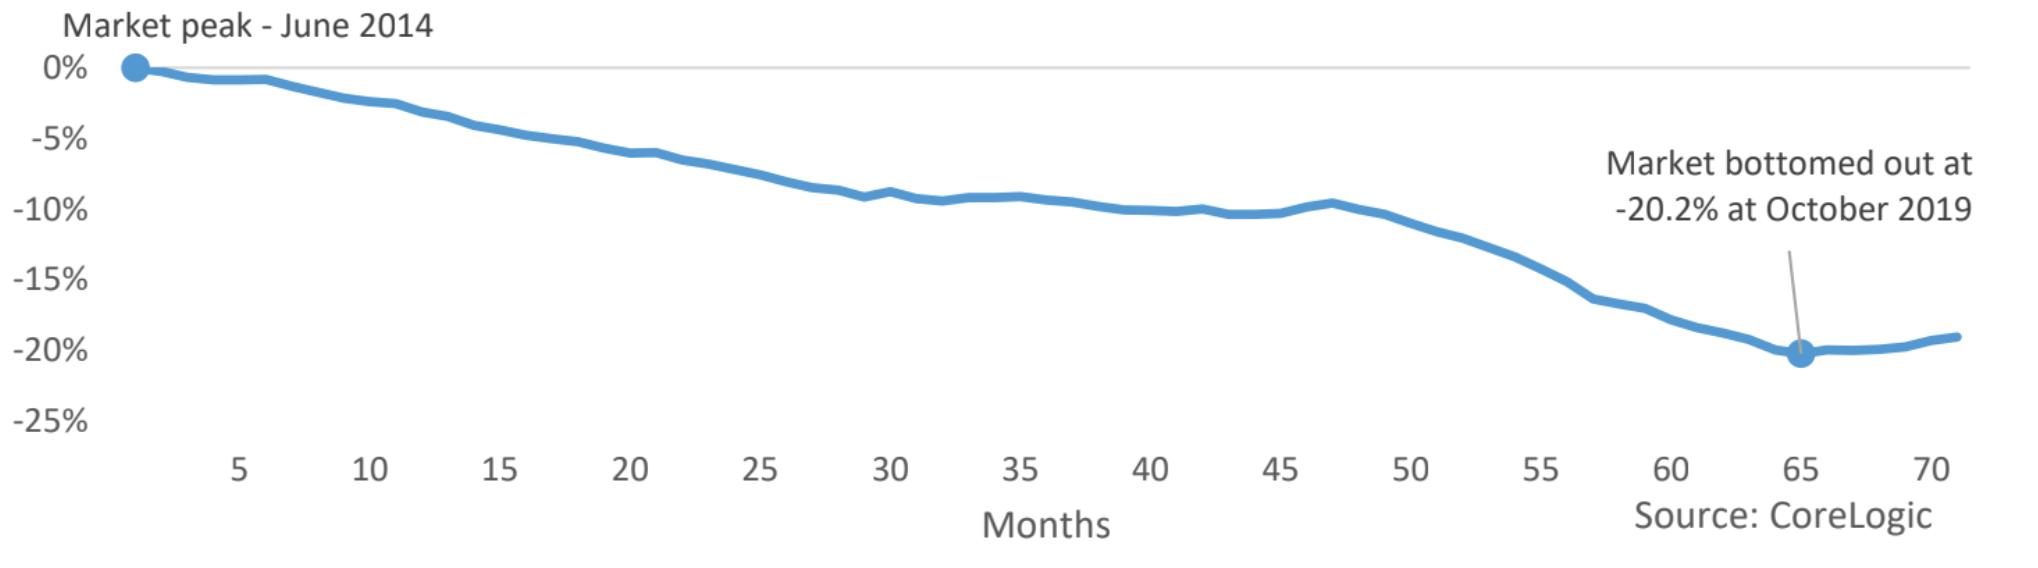 Perth house market - value change relative to peak